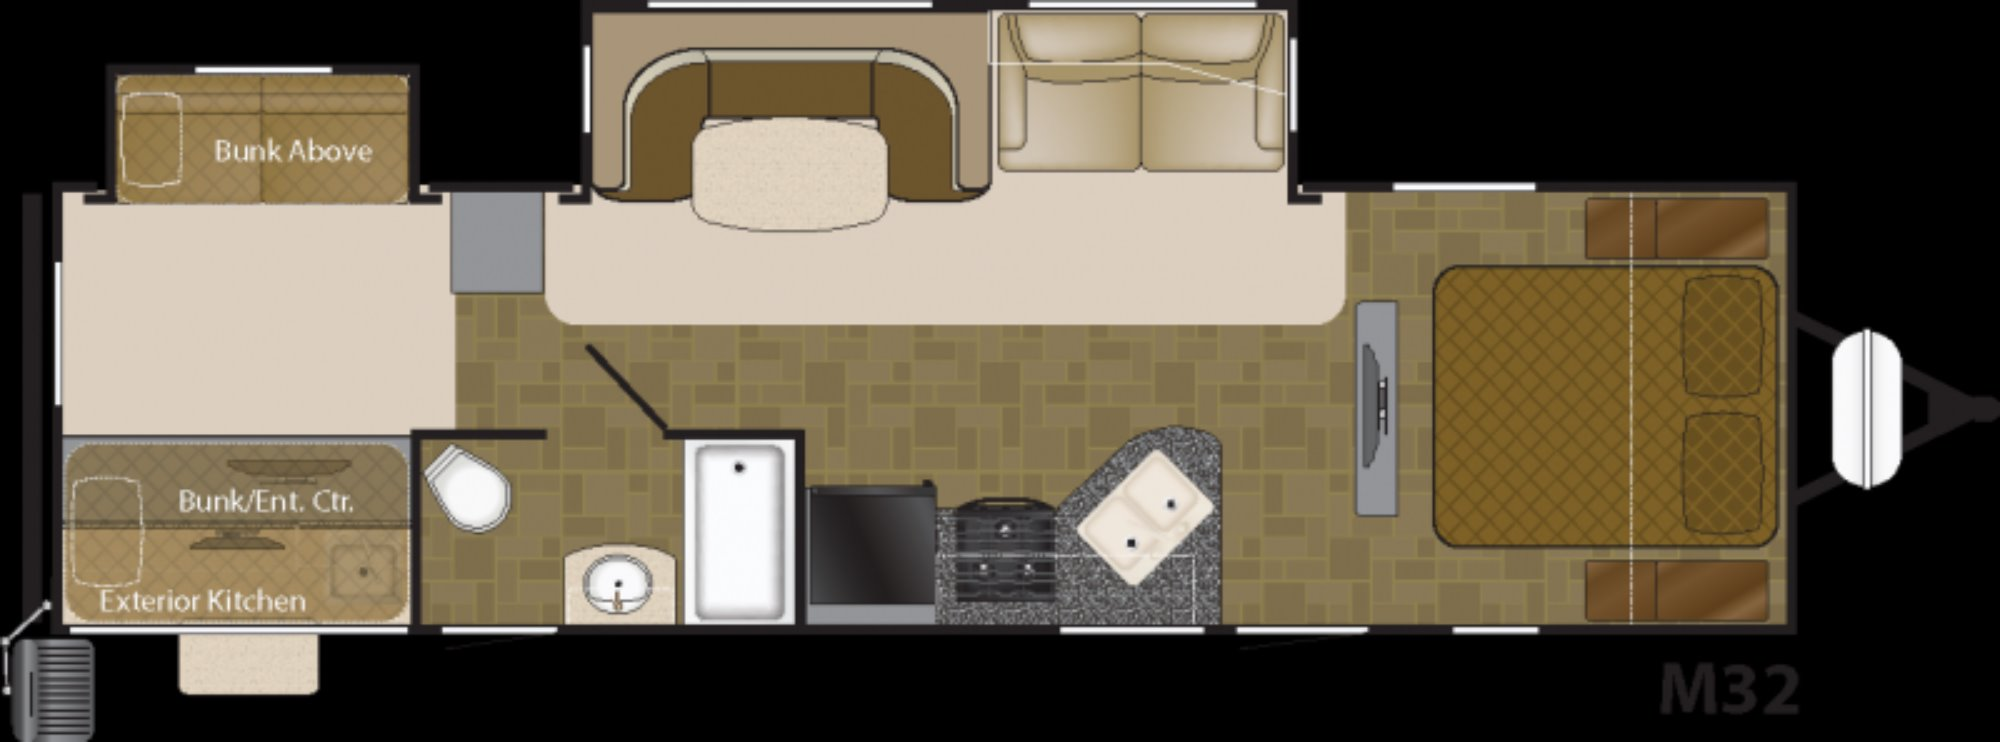 Fleetwood Mallard Rv Floor Plans